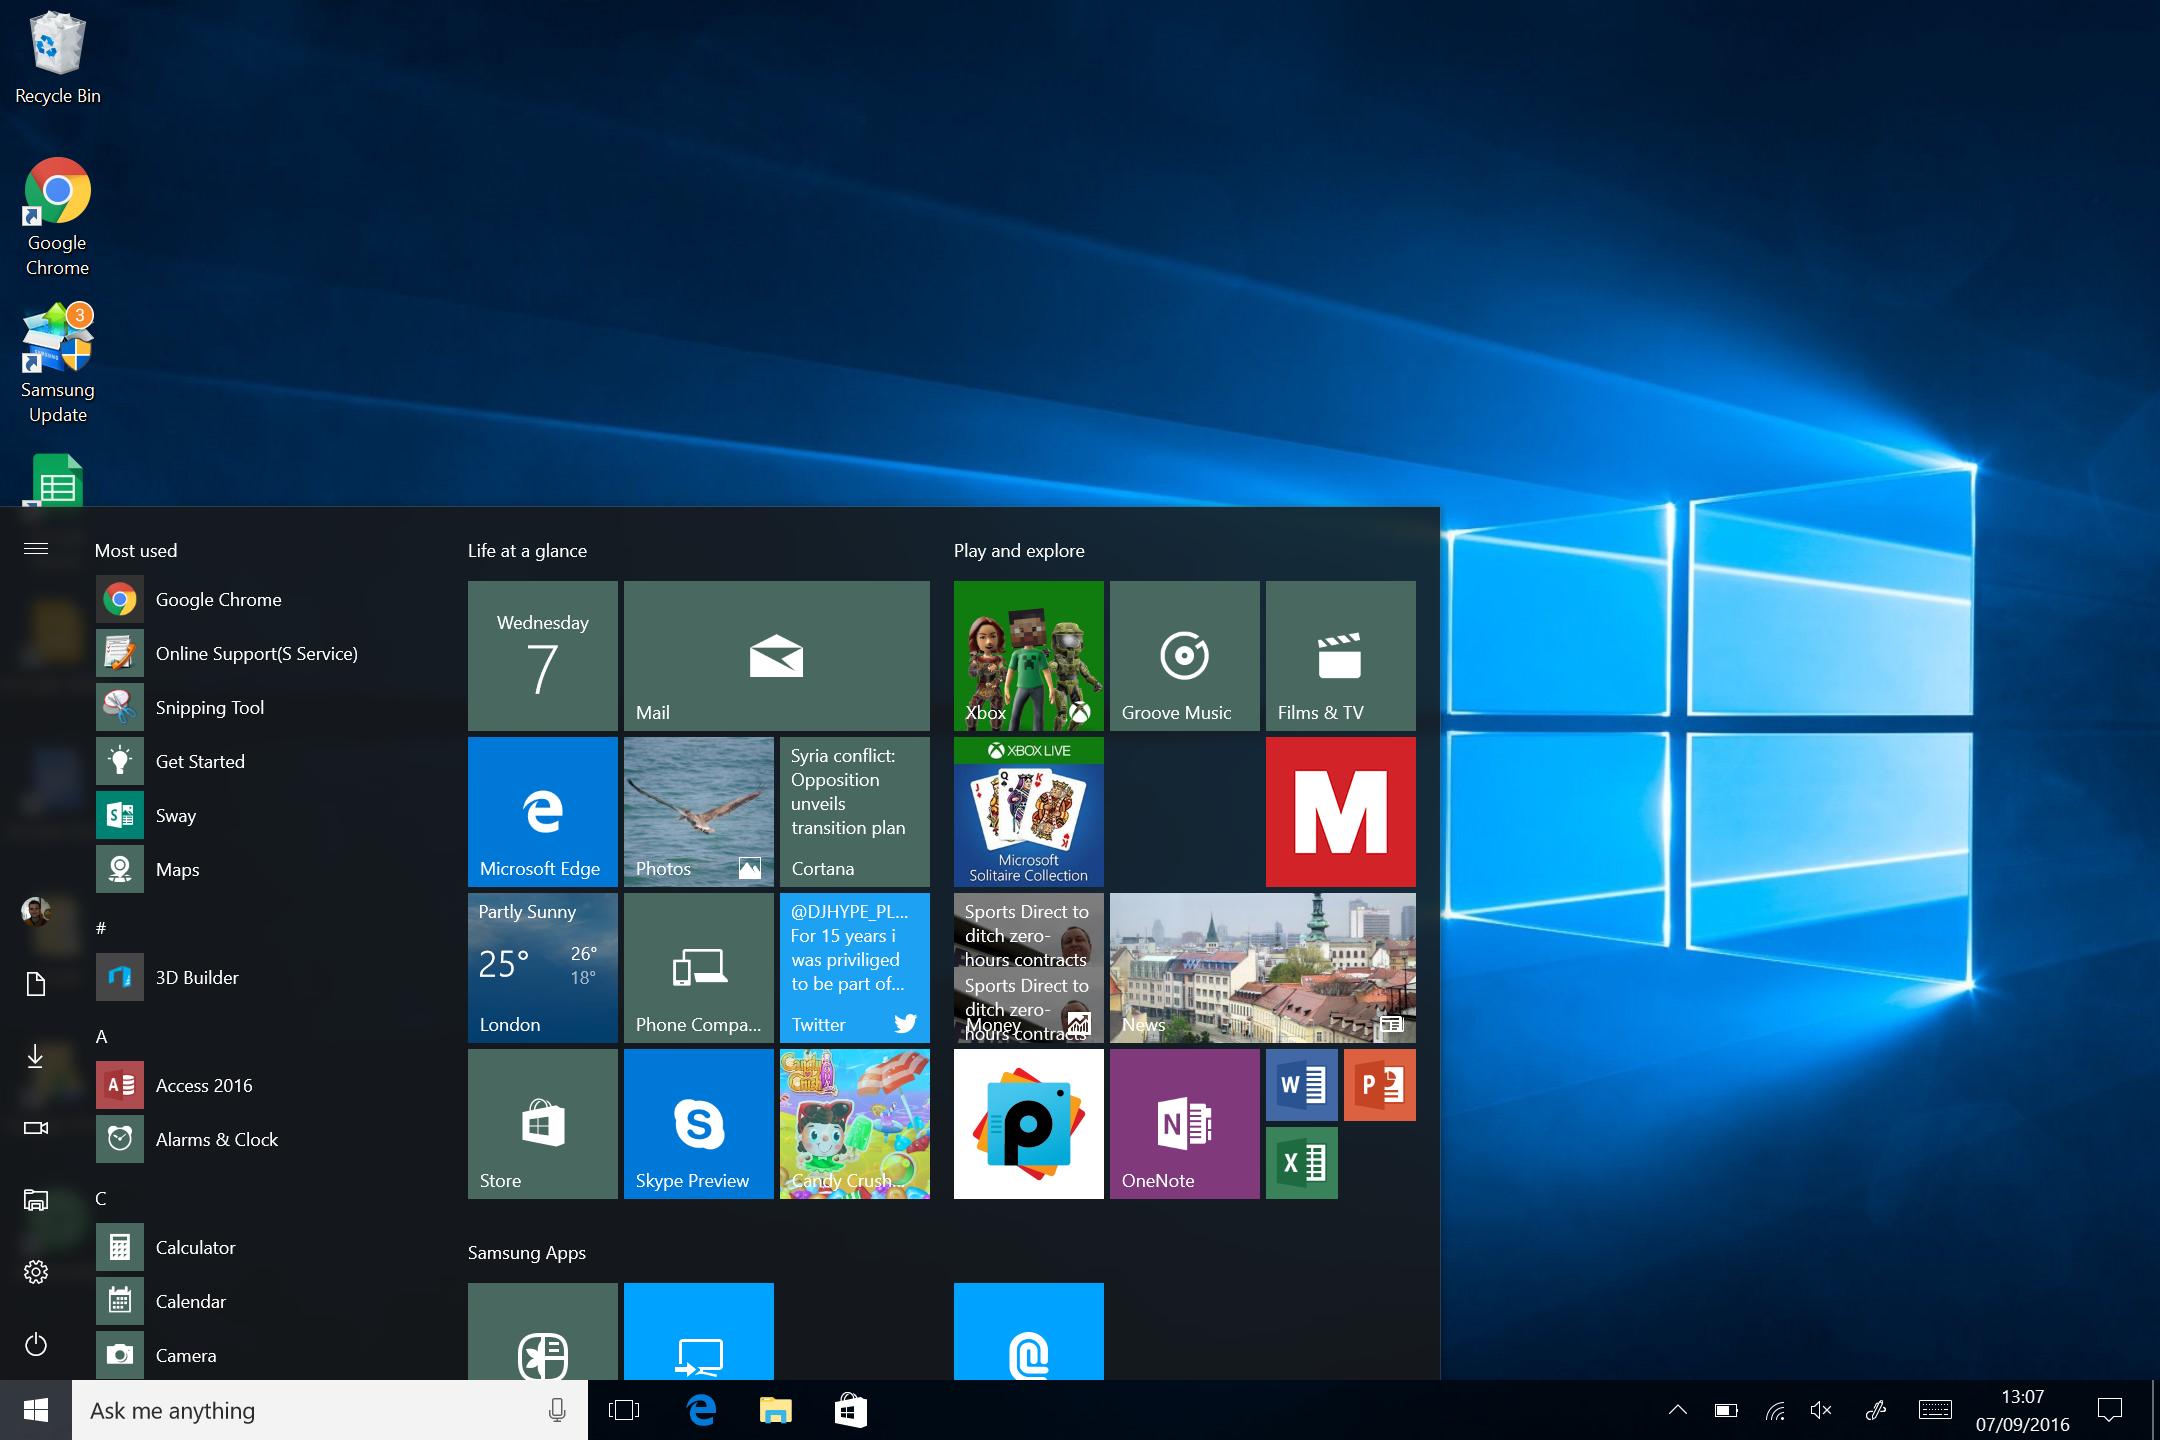 windows 10 upgrade  should i upgrade to windows 10  our